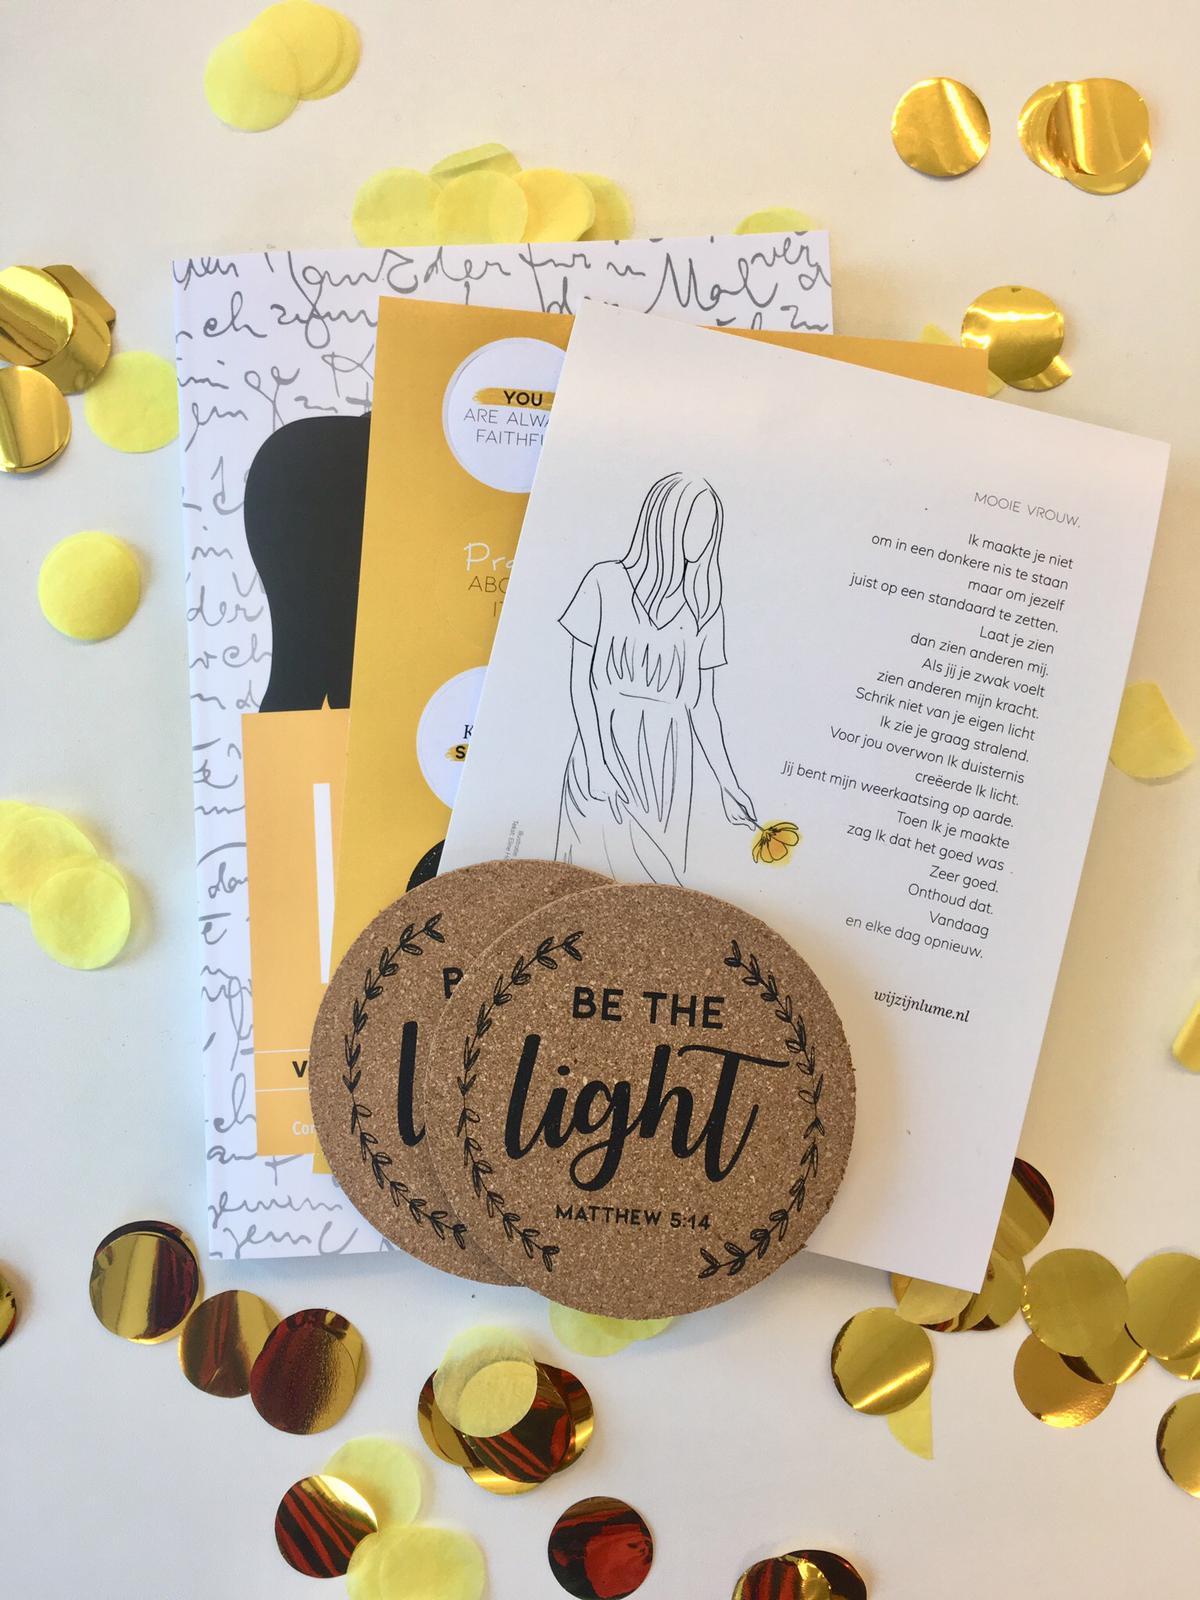 Moederdag, Share the light pakket, cadeau